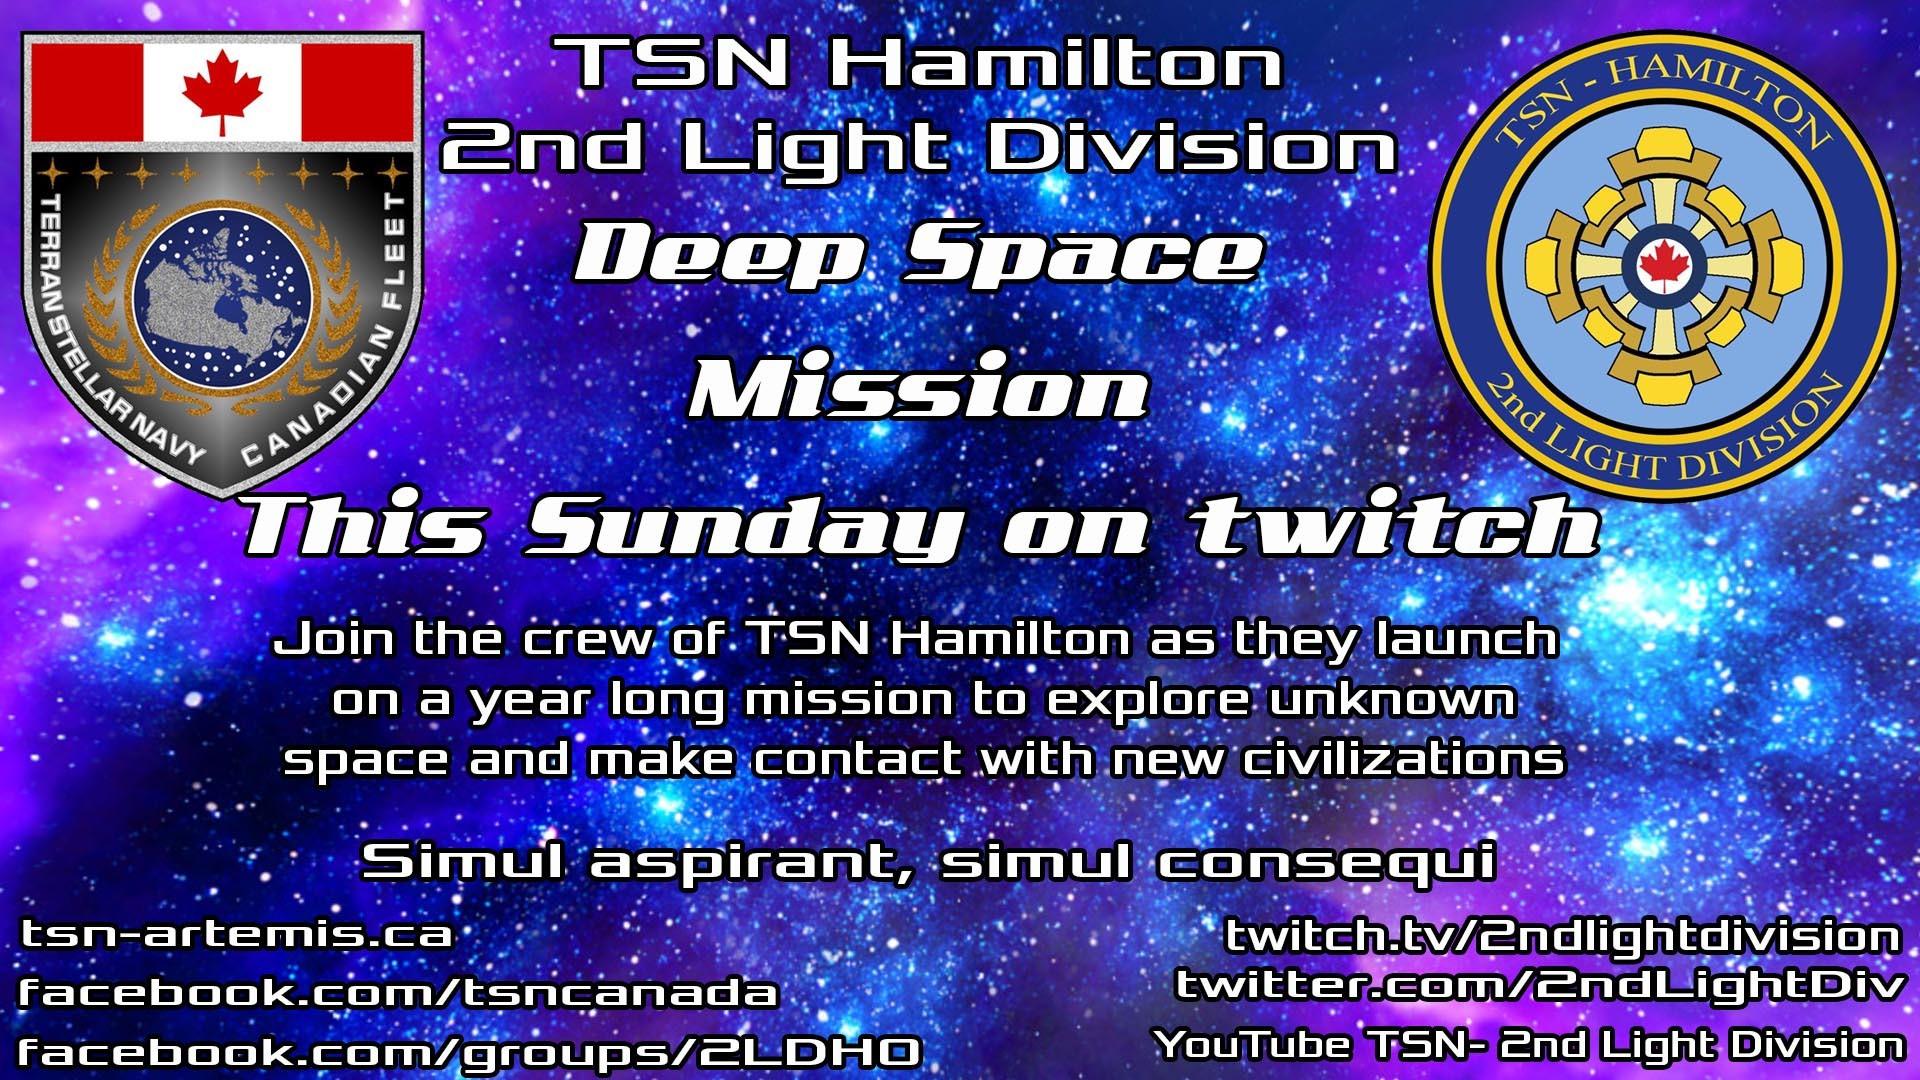 twitch 16-9 deep space web.jpg